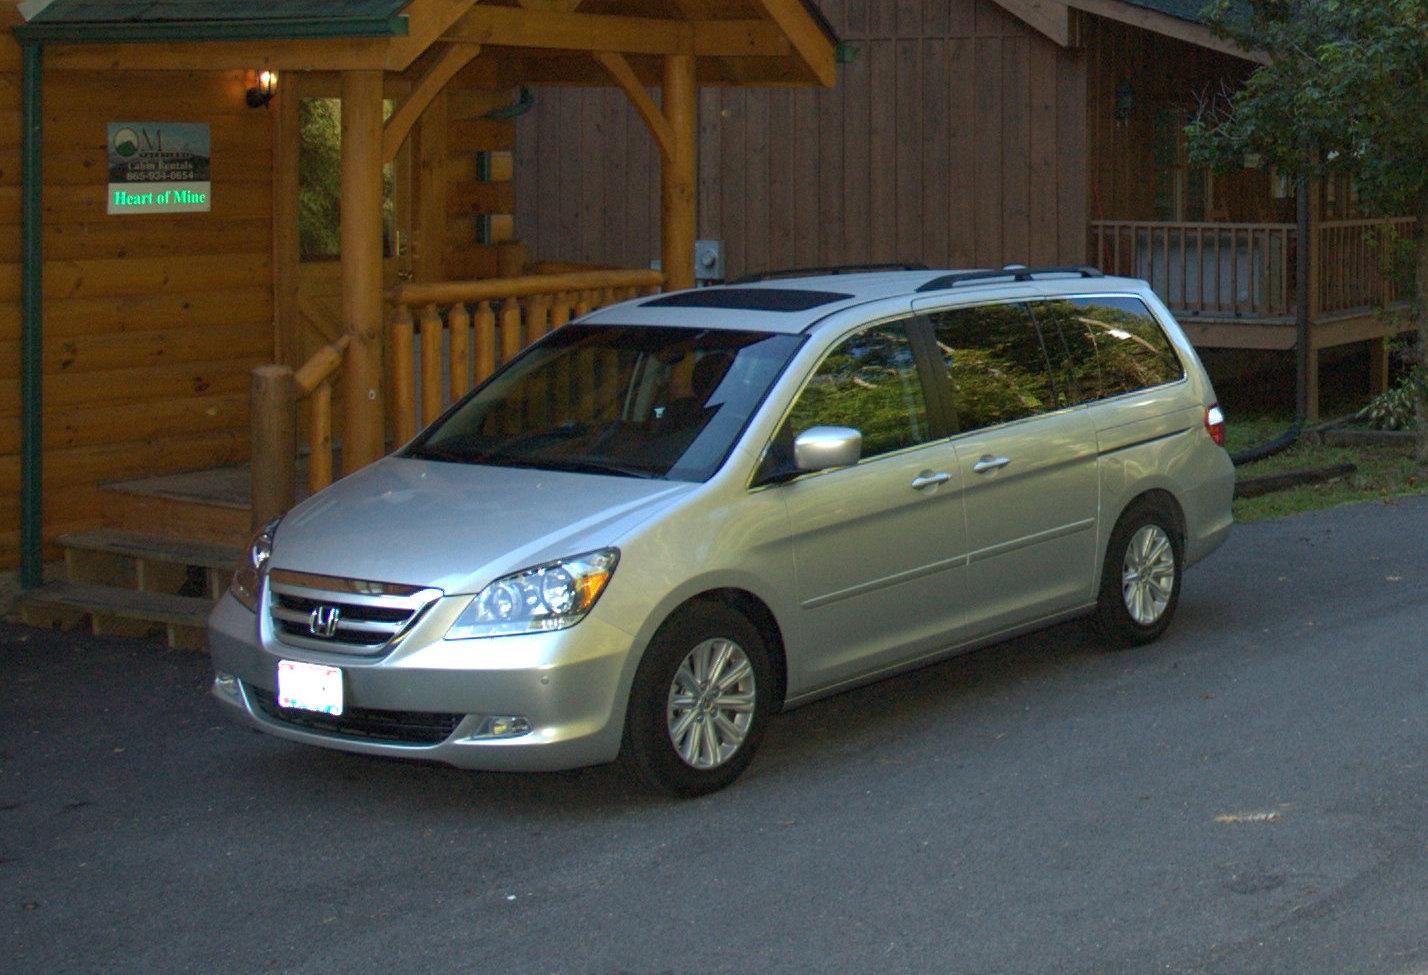 All Chevy 2008 chevy venture van : 2005 Chevrolet Venture - Overview - CarGurus